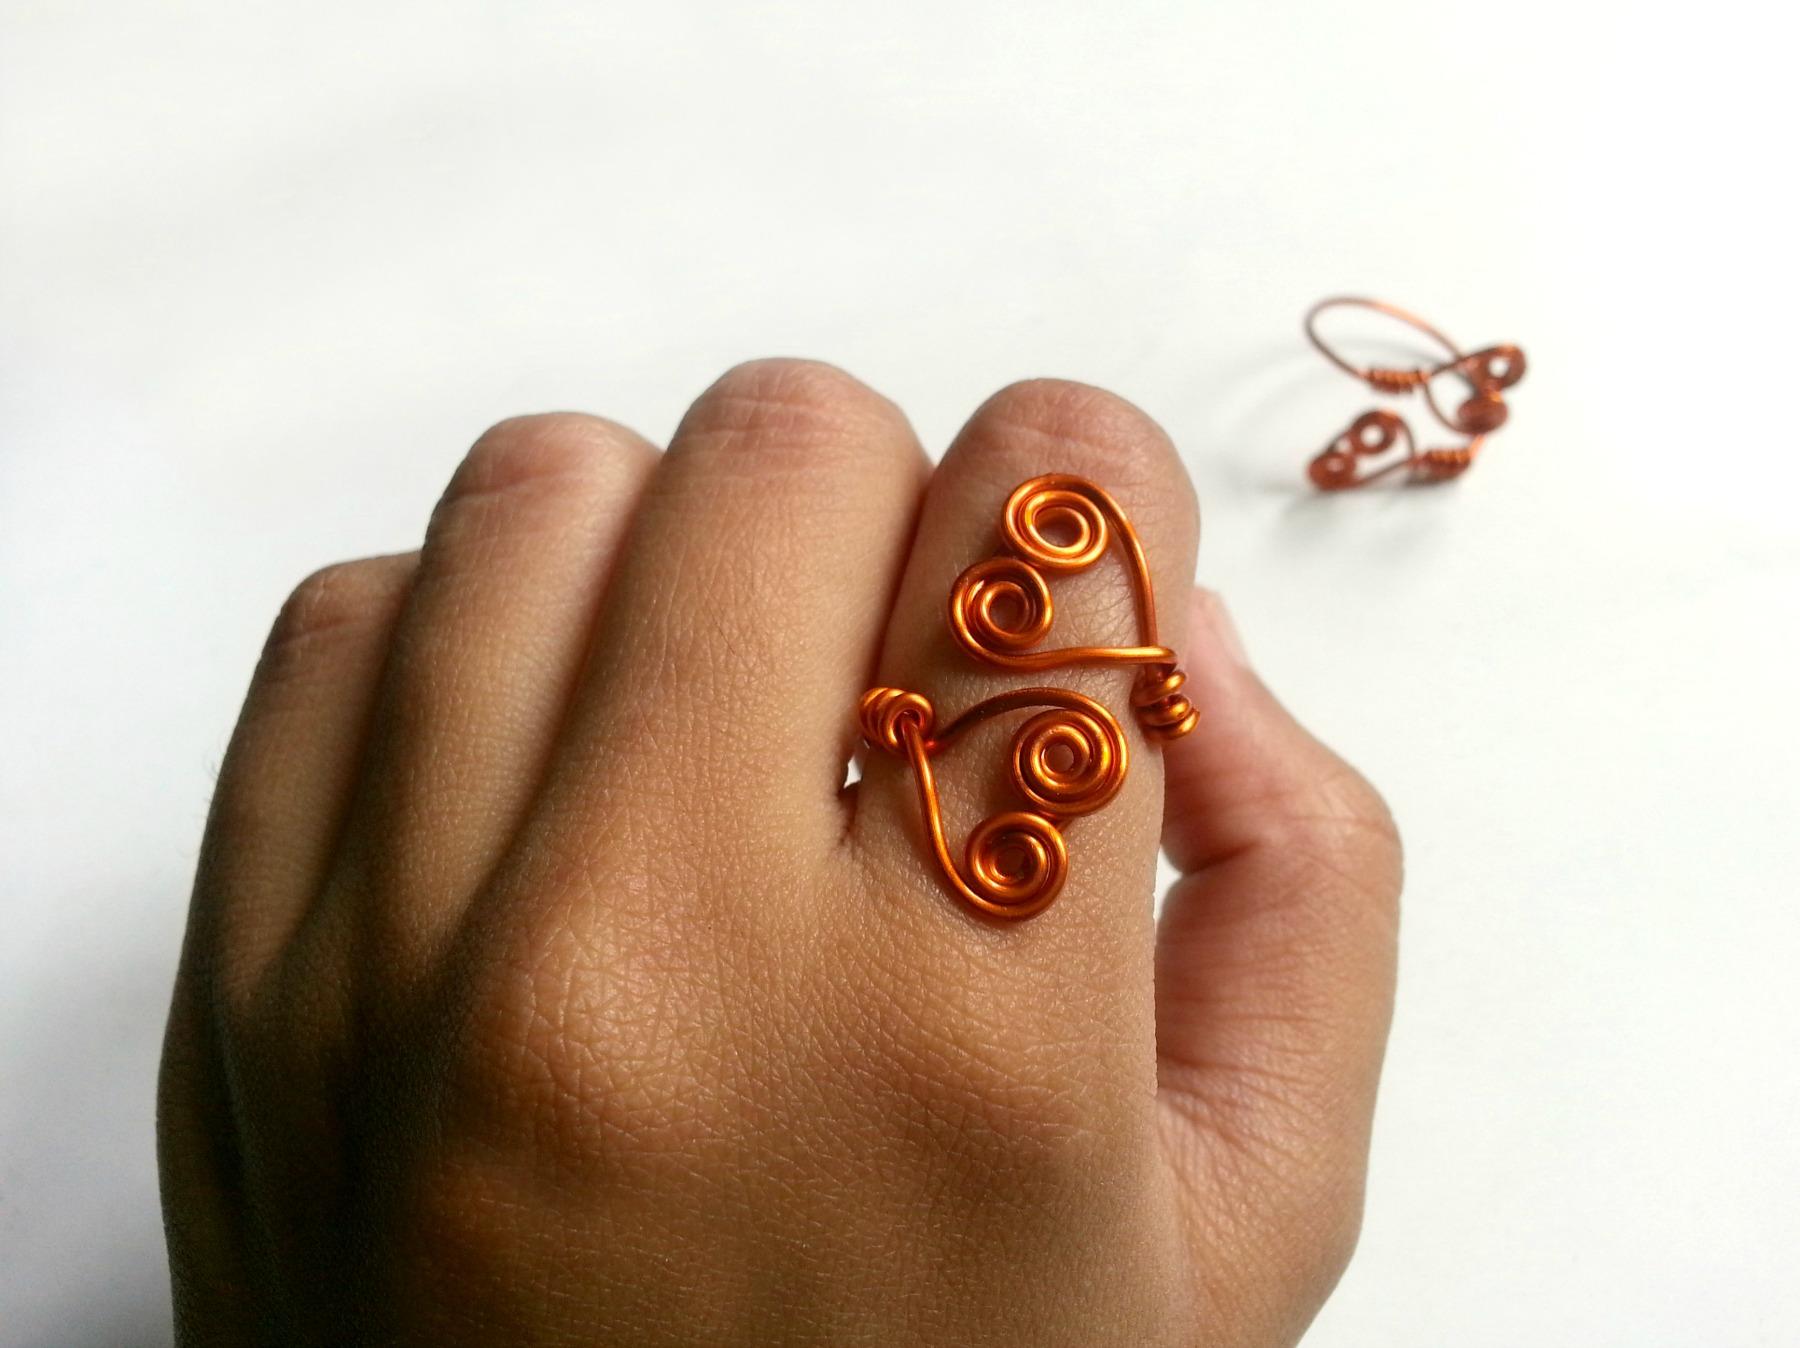 DIY Swirly Double-Heart Ring